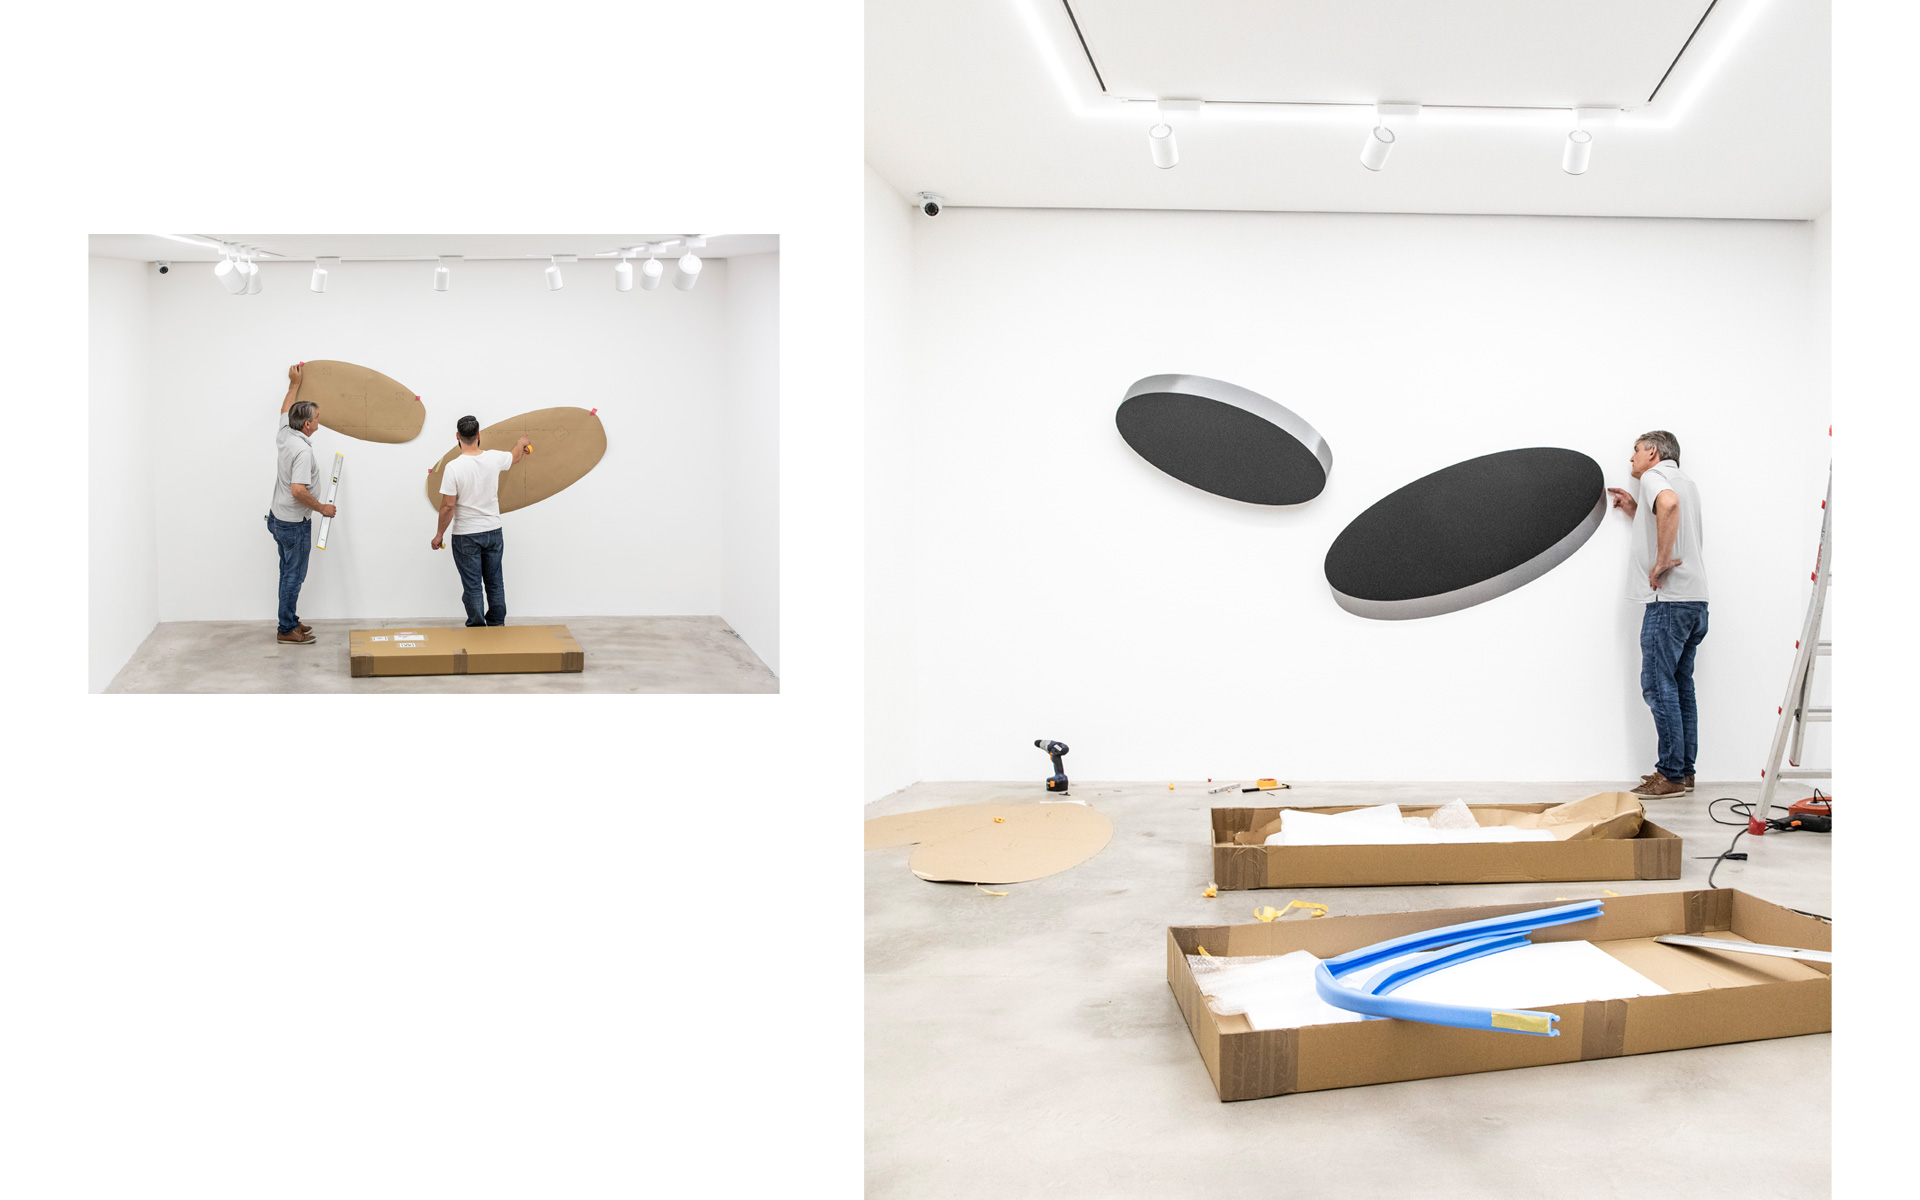 Installation views Gallery DEP ART, Milano, 2018 - Photos: Fabio Mantegna